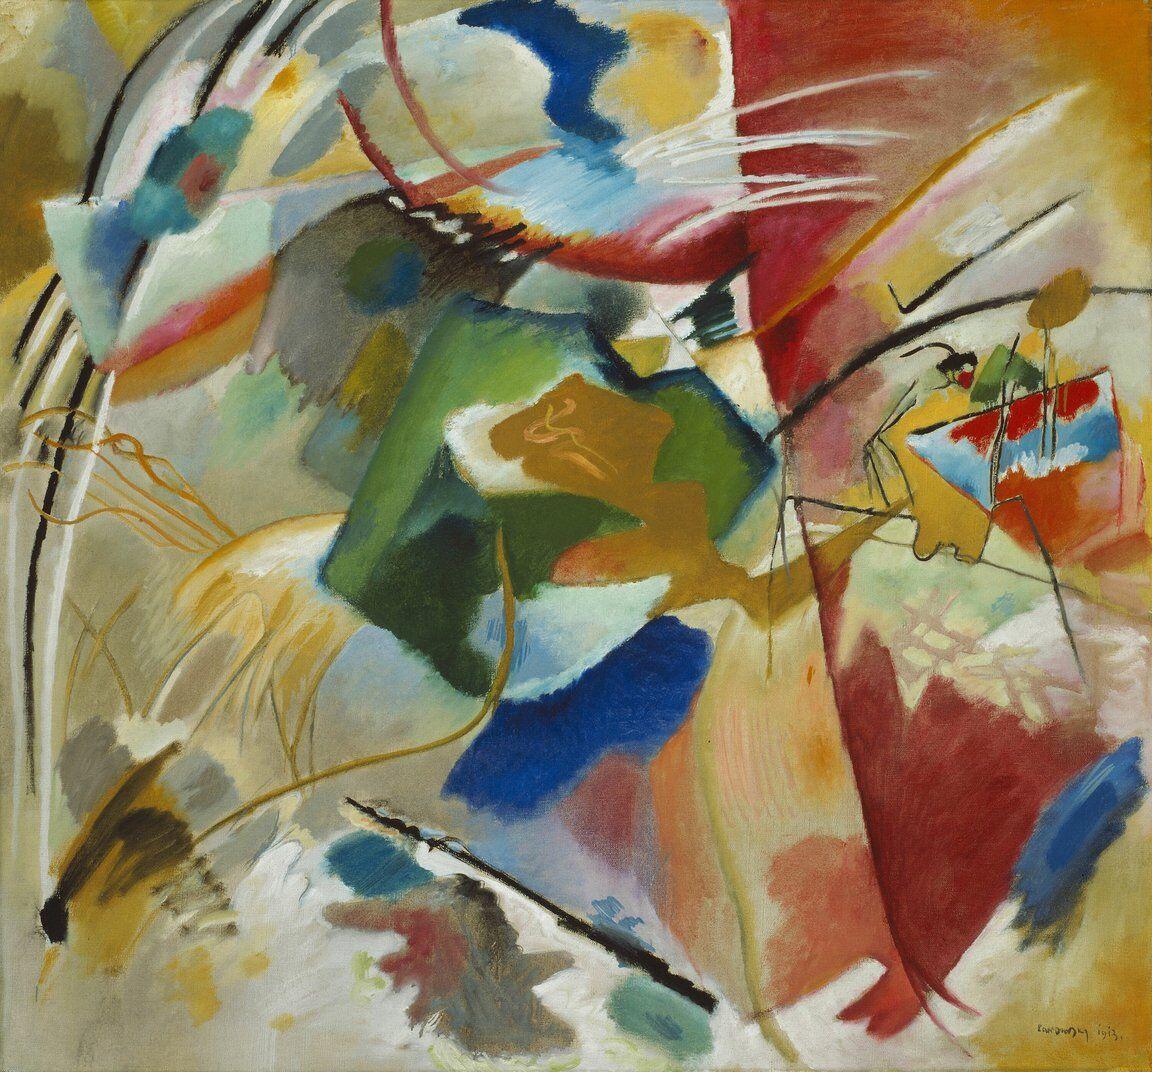 Vasily Kandinsky Painting with Green Center